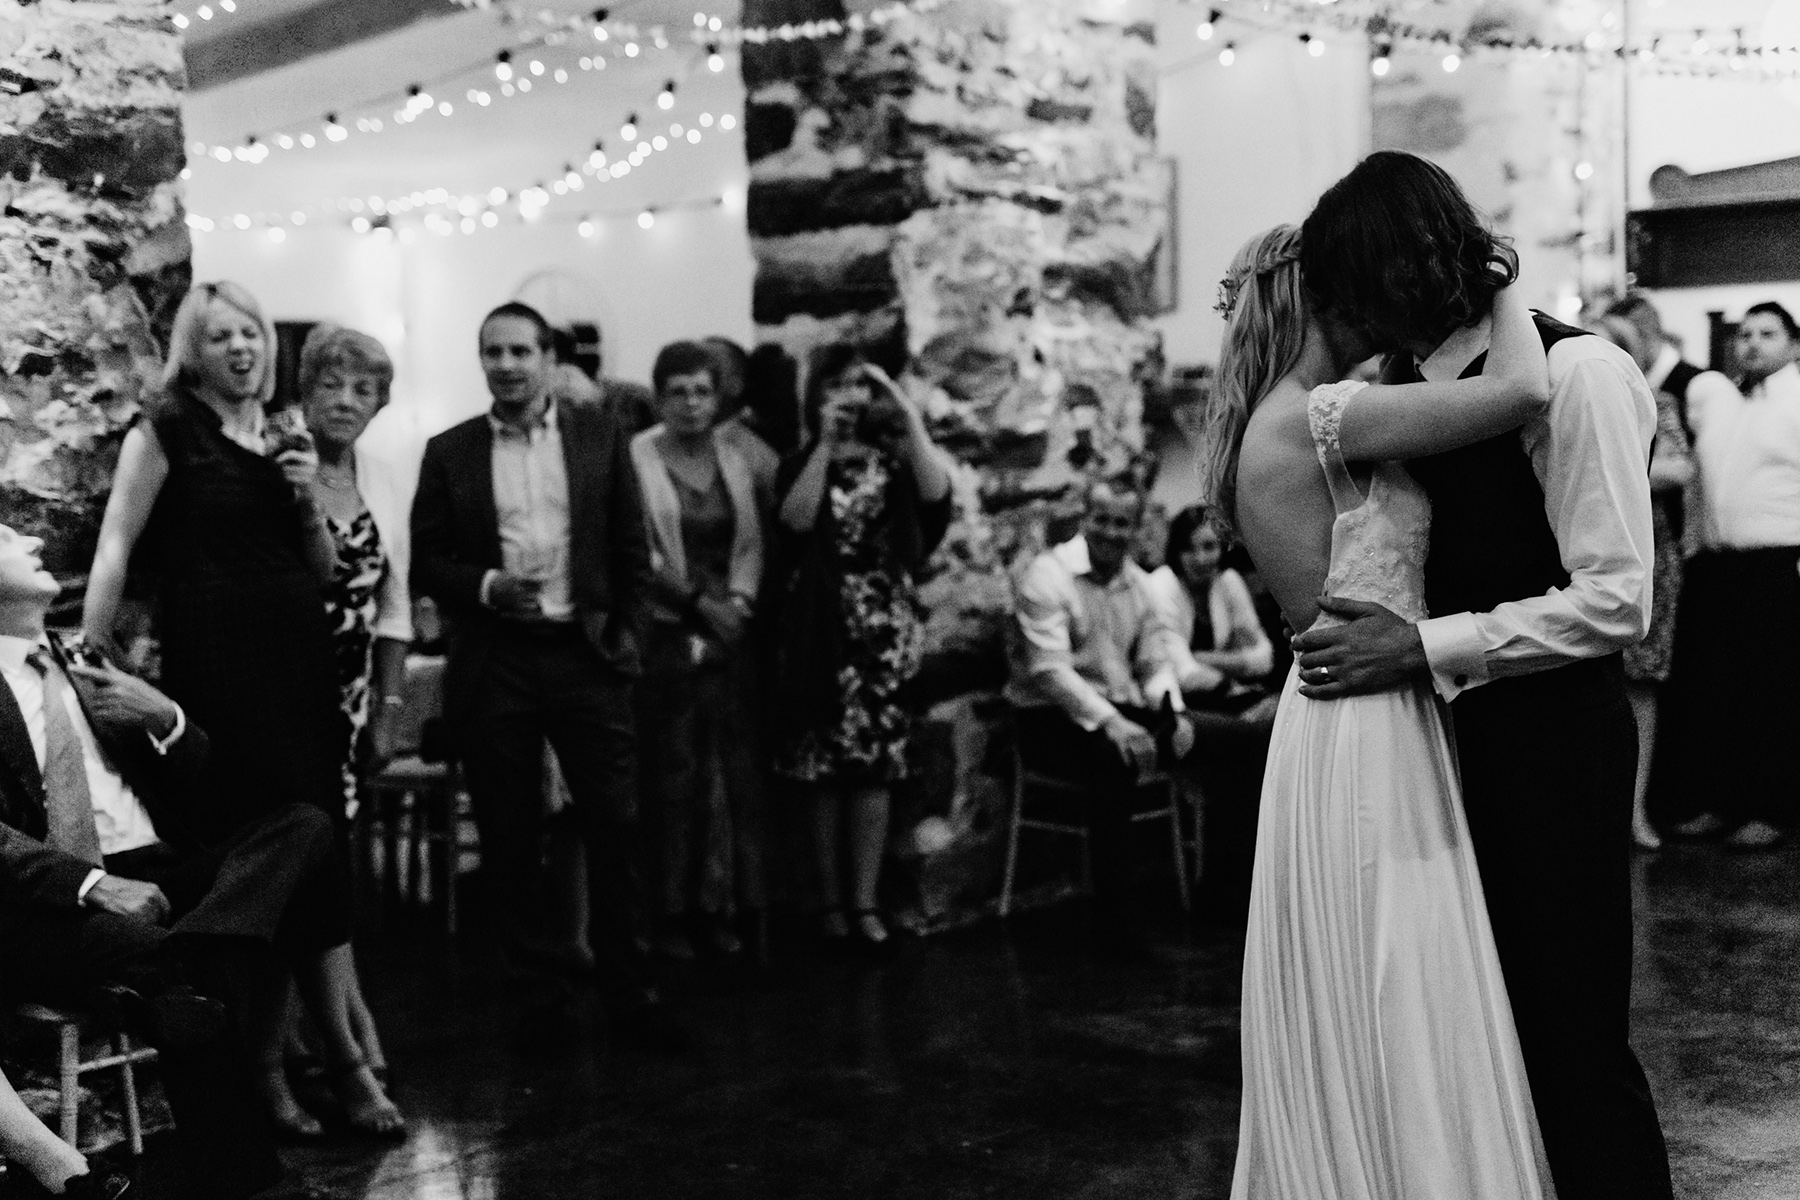 Snowdonia-Wales-Wedding-Photos-0403.jpg